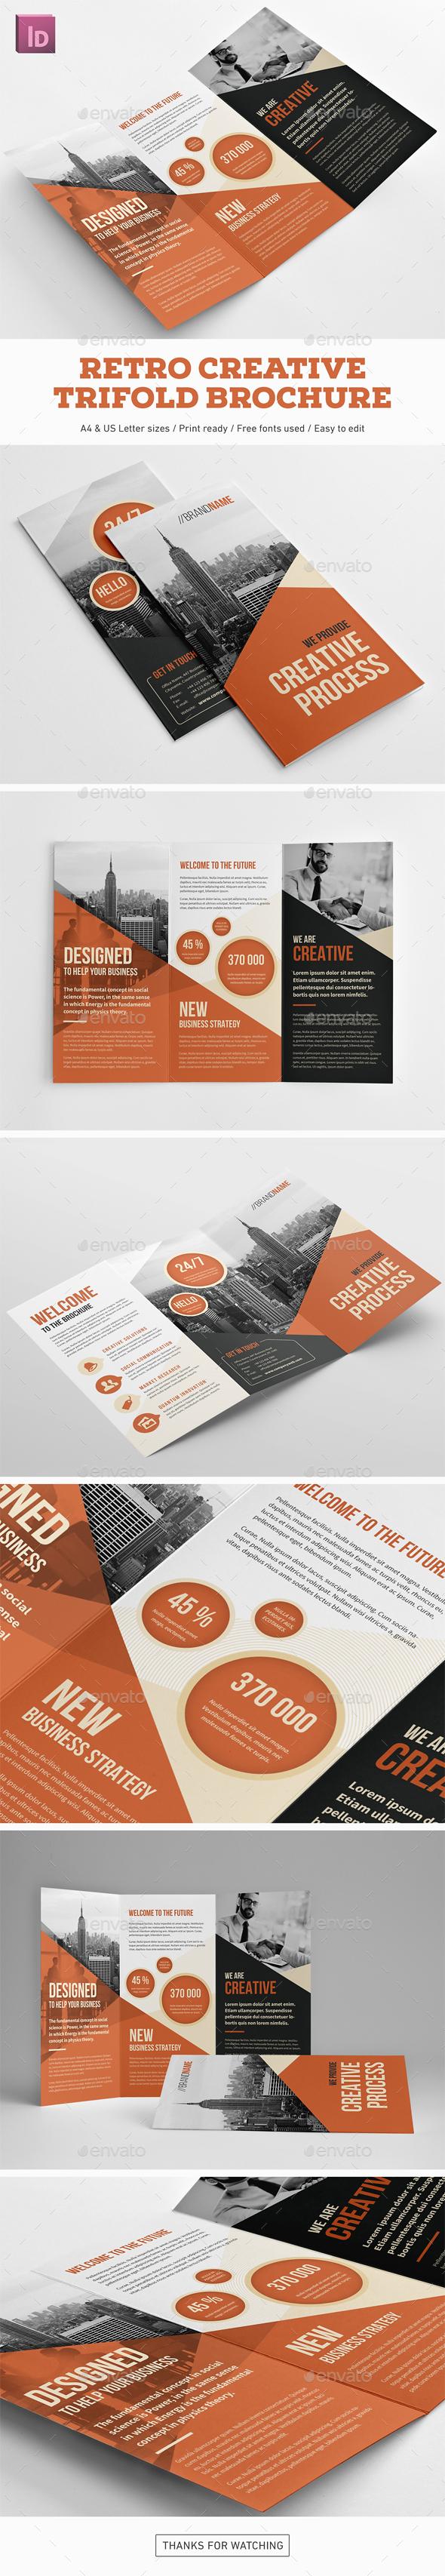 Retro Creative Trifold Brochure - Corporate Brochures